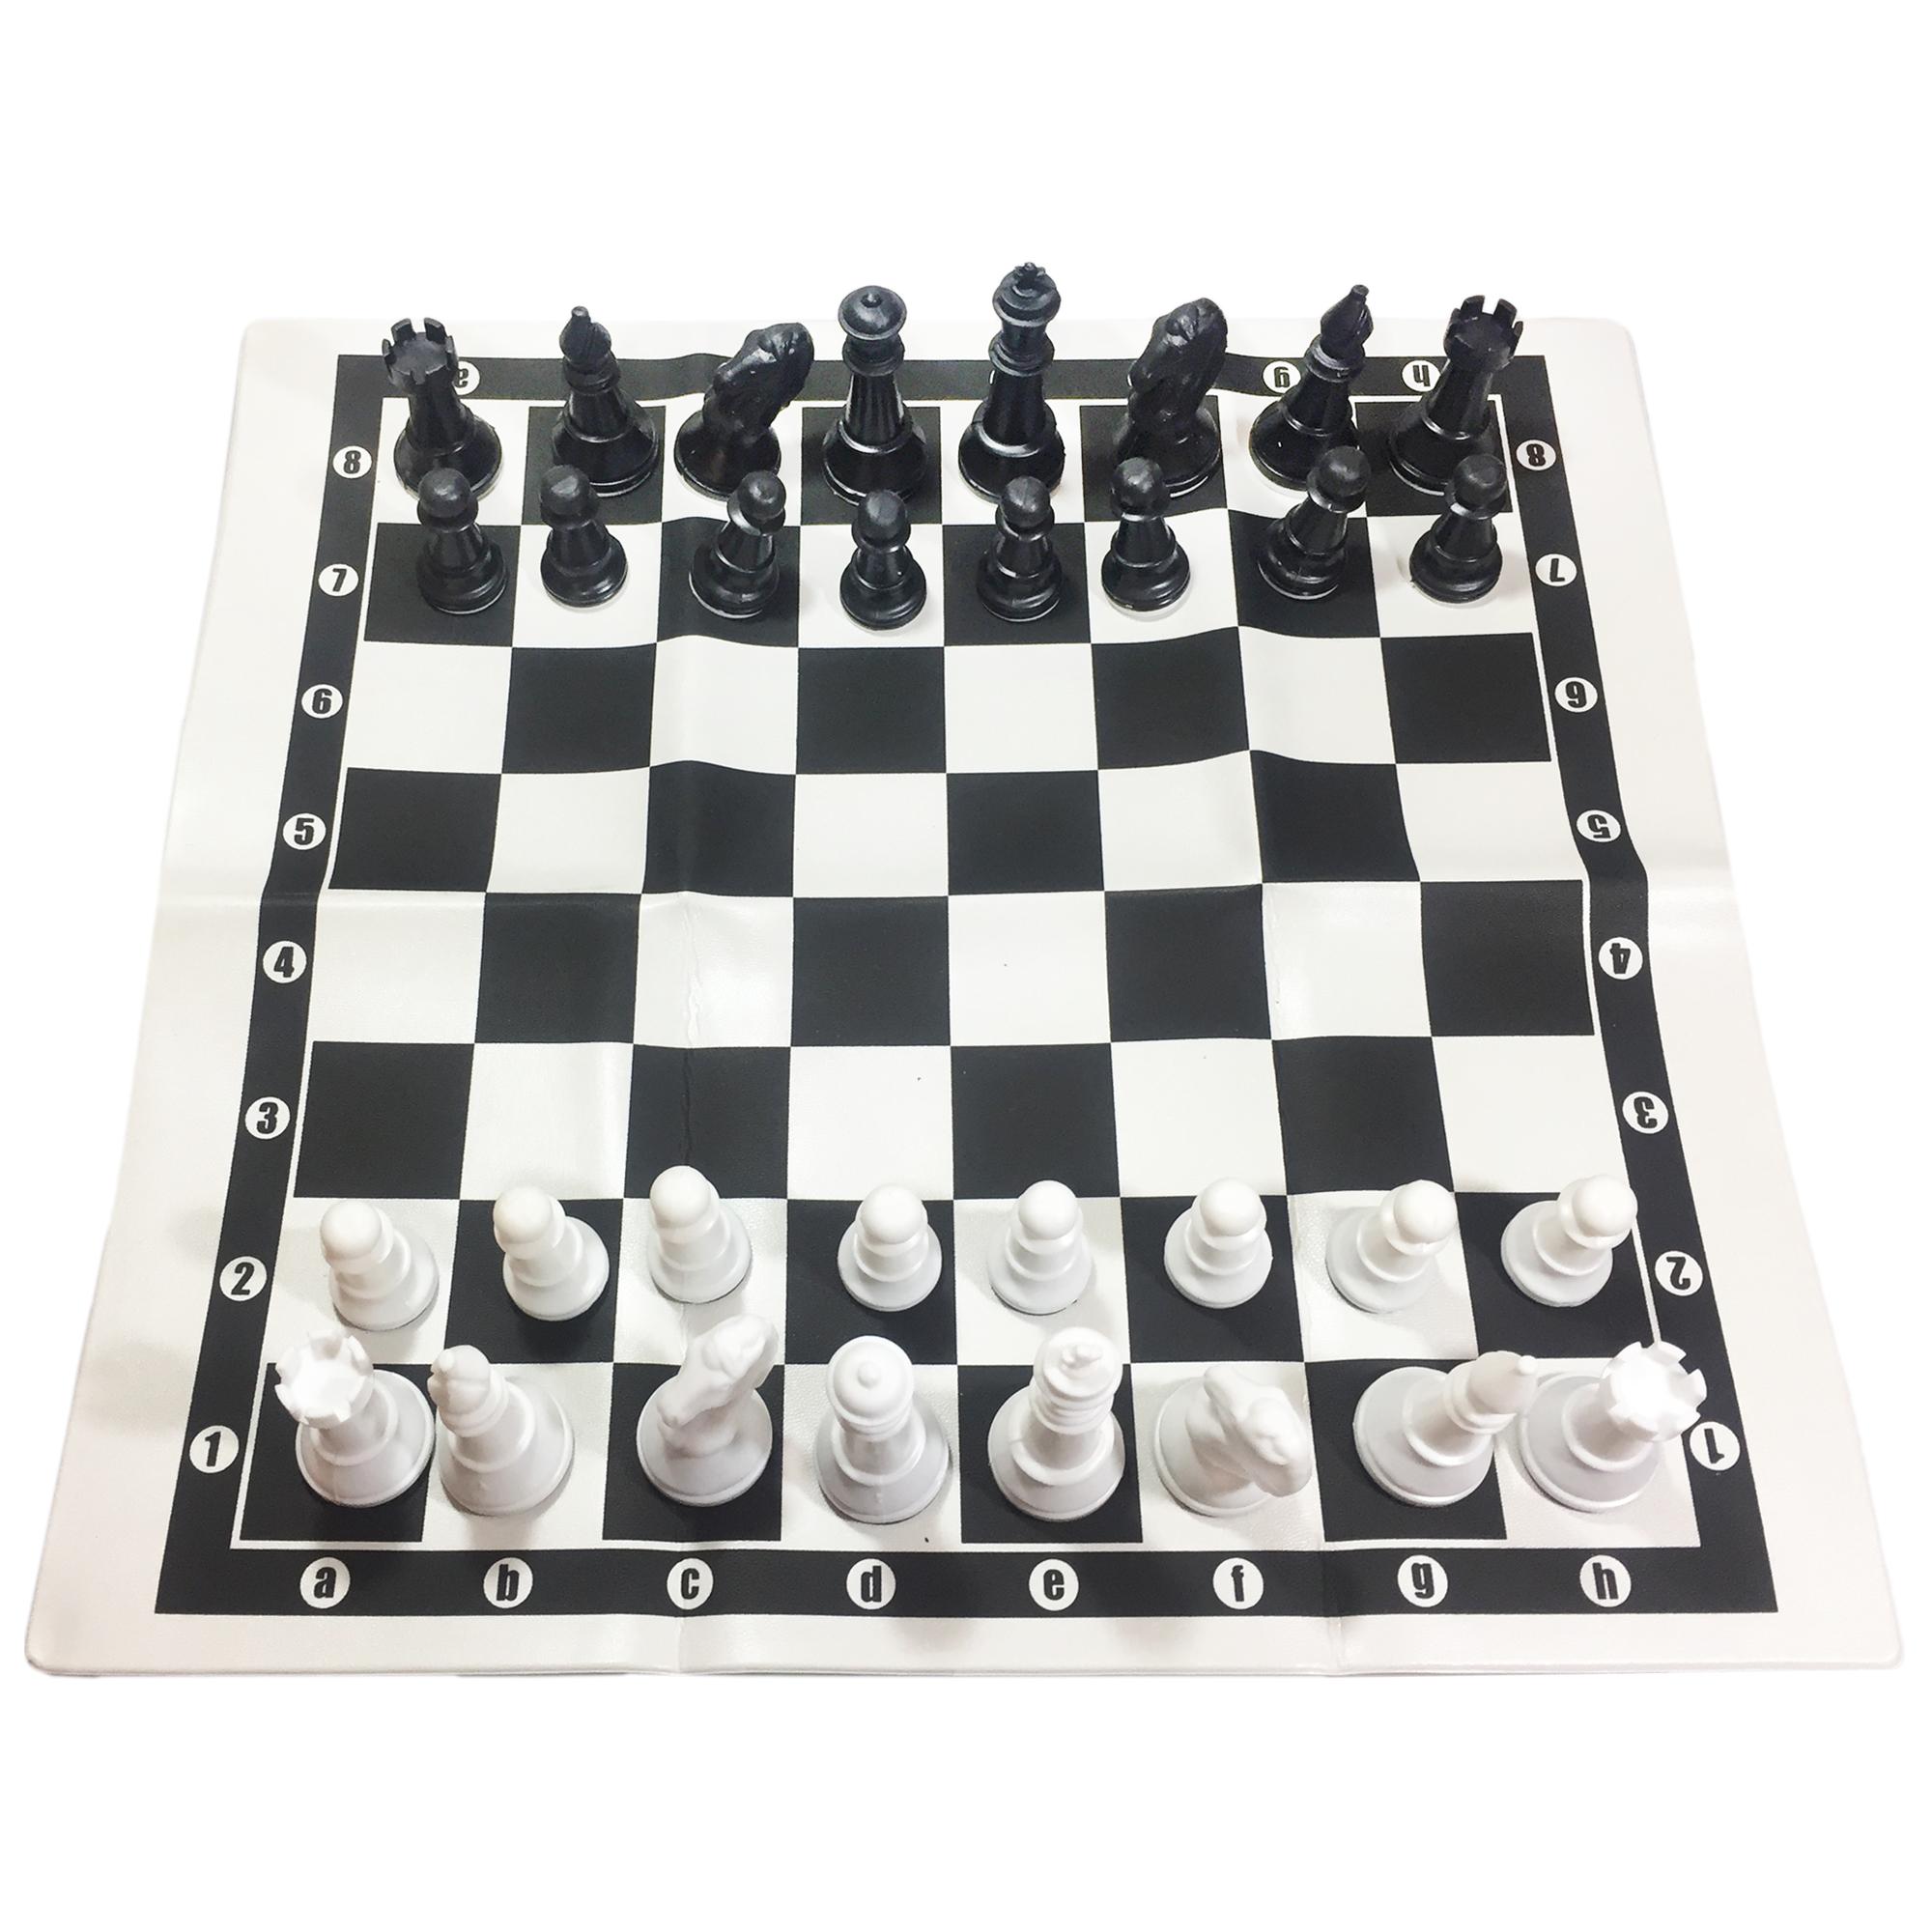 شطرنج فرهنگ کد 5000